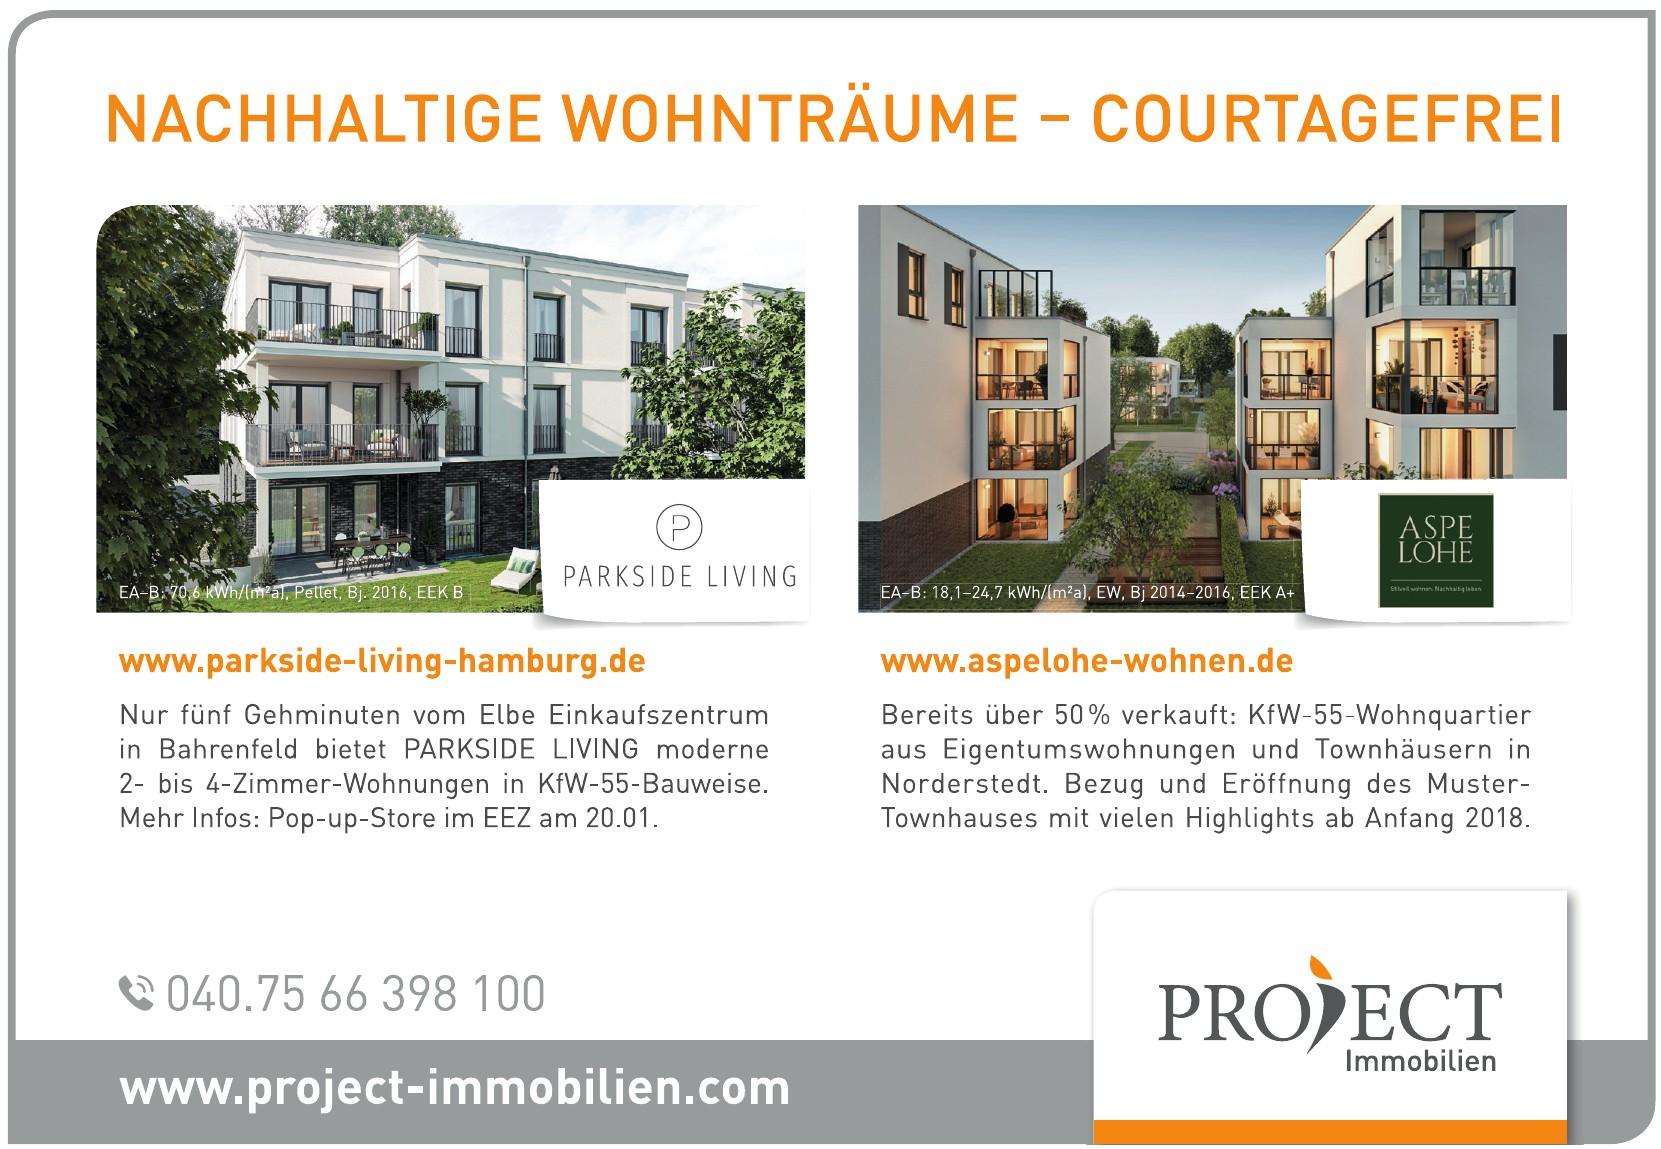 Projekt Immobilien